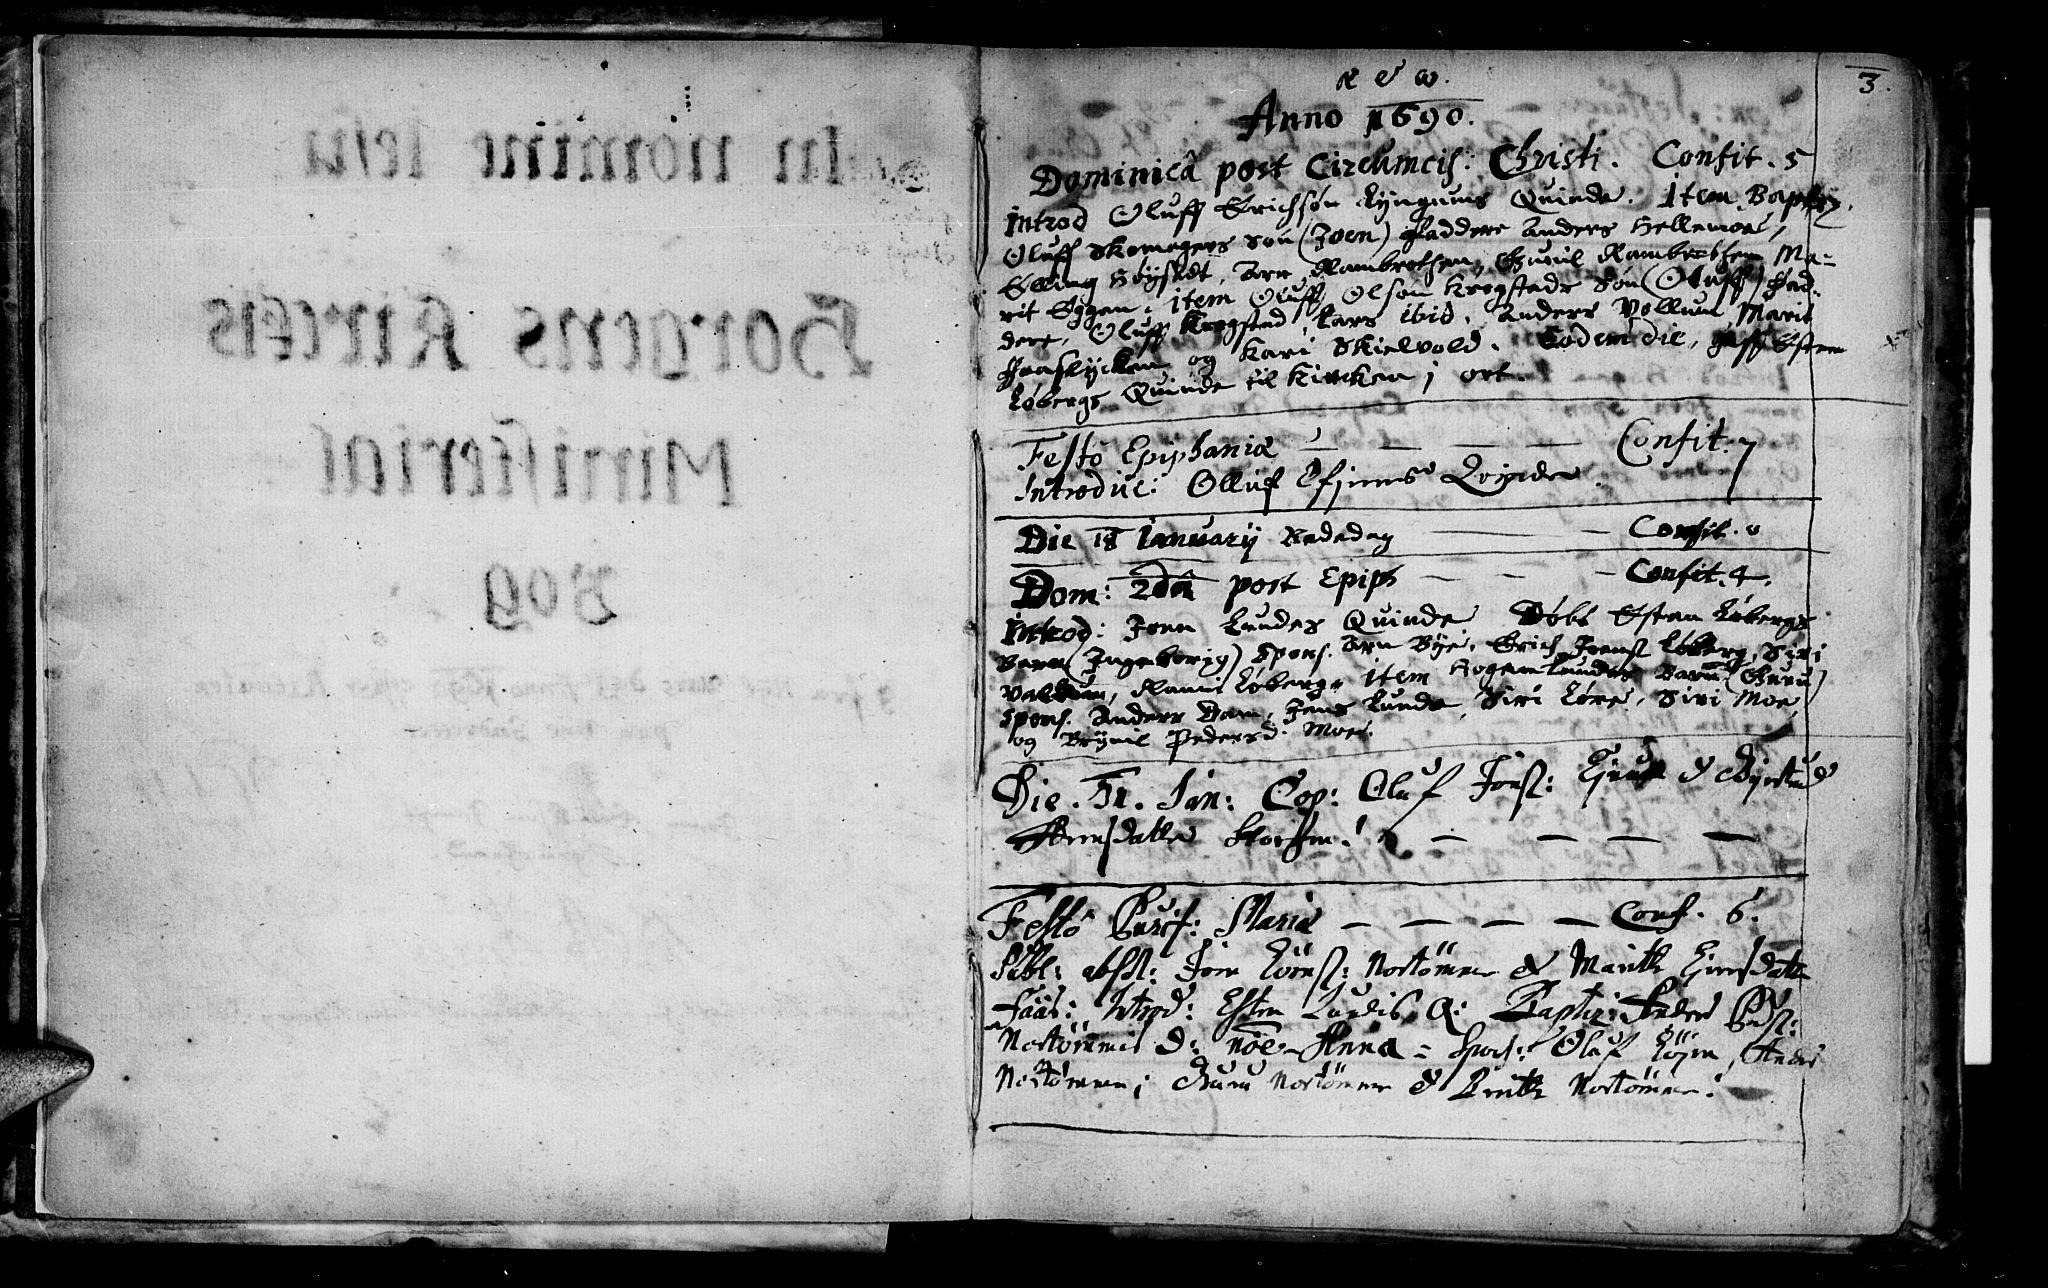 SAT, Ministerialprotokoller, klokkerbøker og fødselsregistre - Sør-Trøndelag, 692/L1101: Parish register (official) no. 692A01, 1690-1746, p. 3